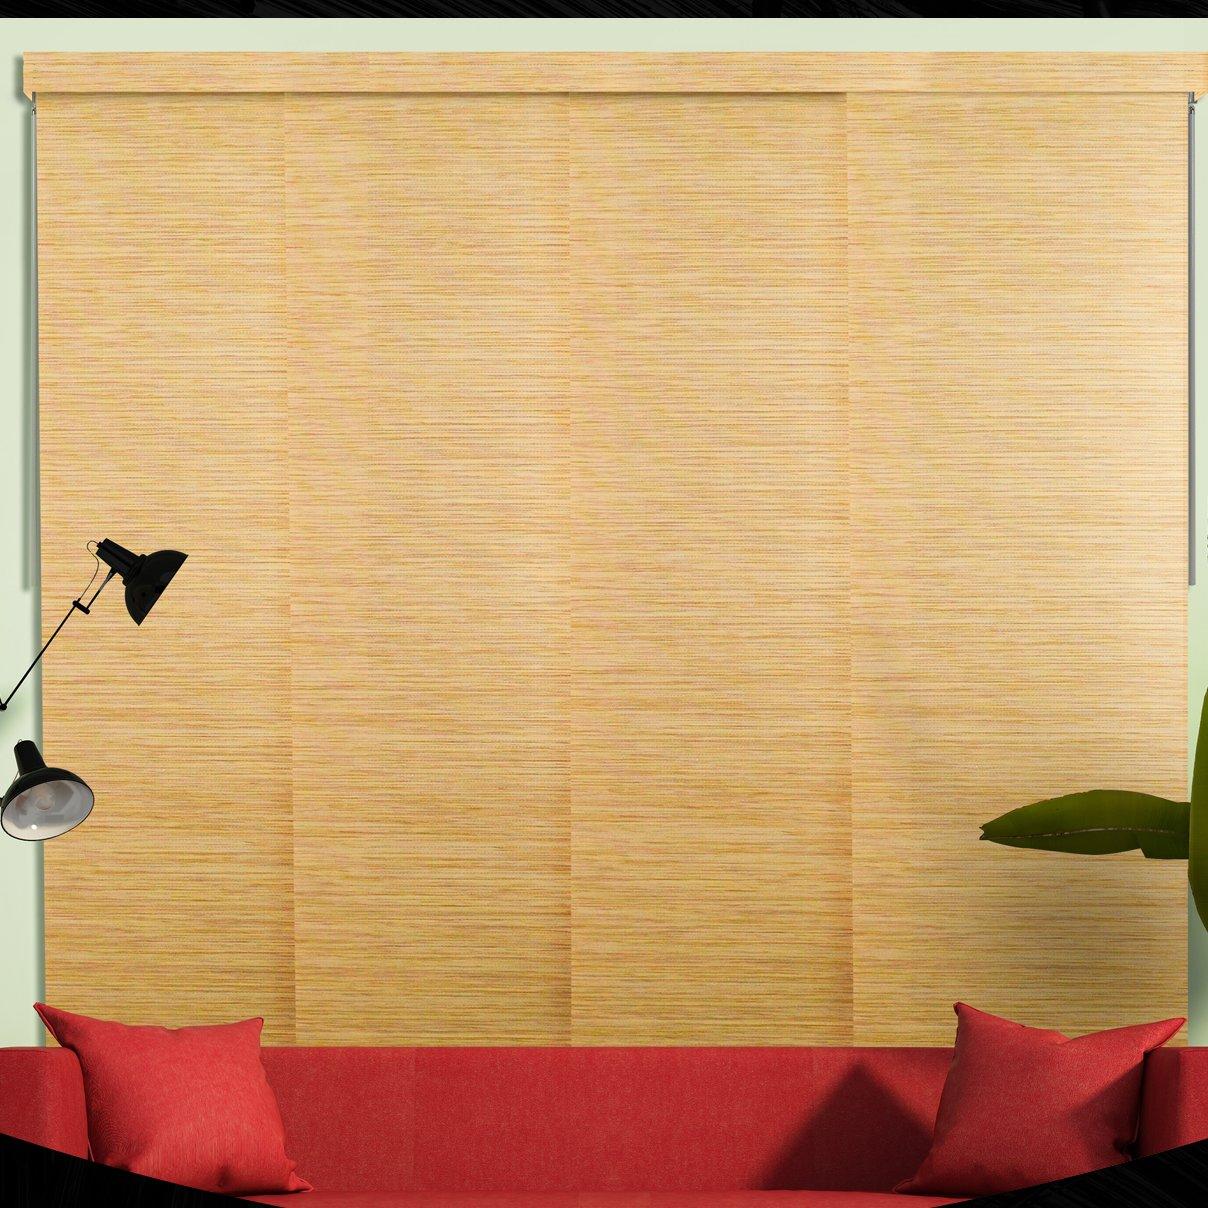 Excellent Menards Window Blinds for Best Window Blind Ideas: Menards Window Blinds | Menards Push Mower | Menards Weekly Ads